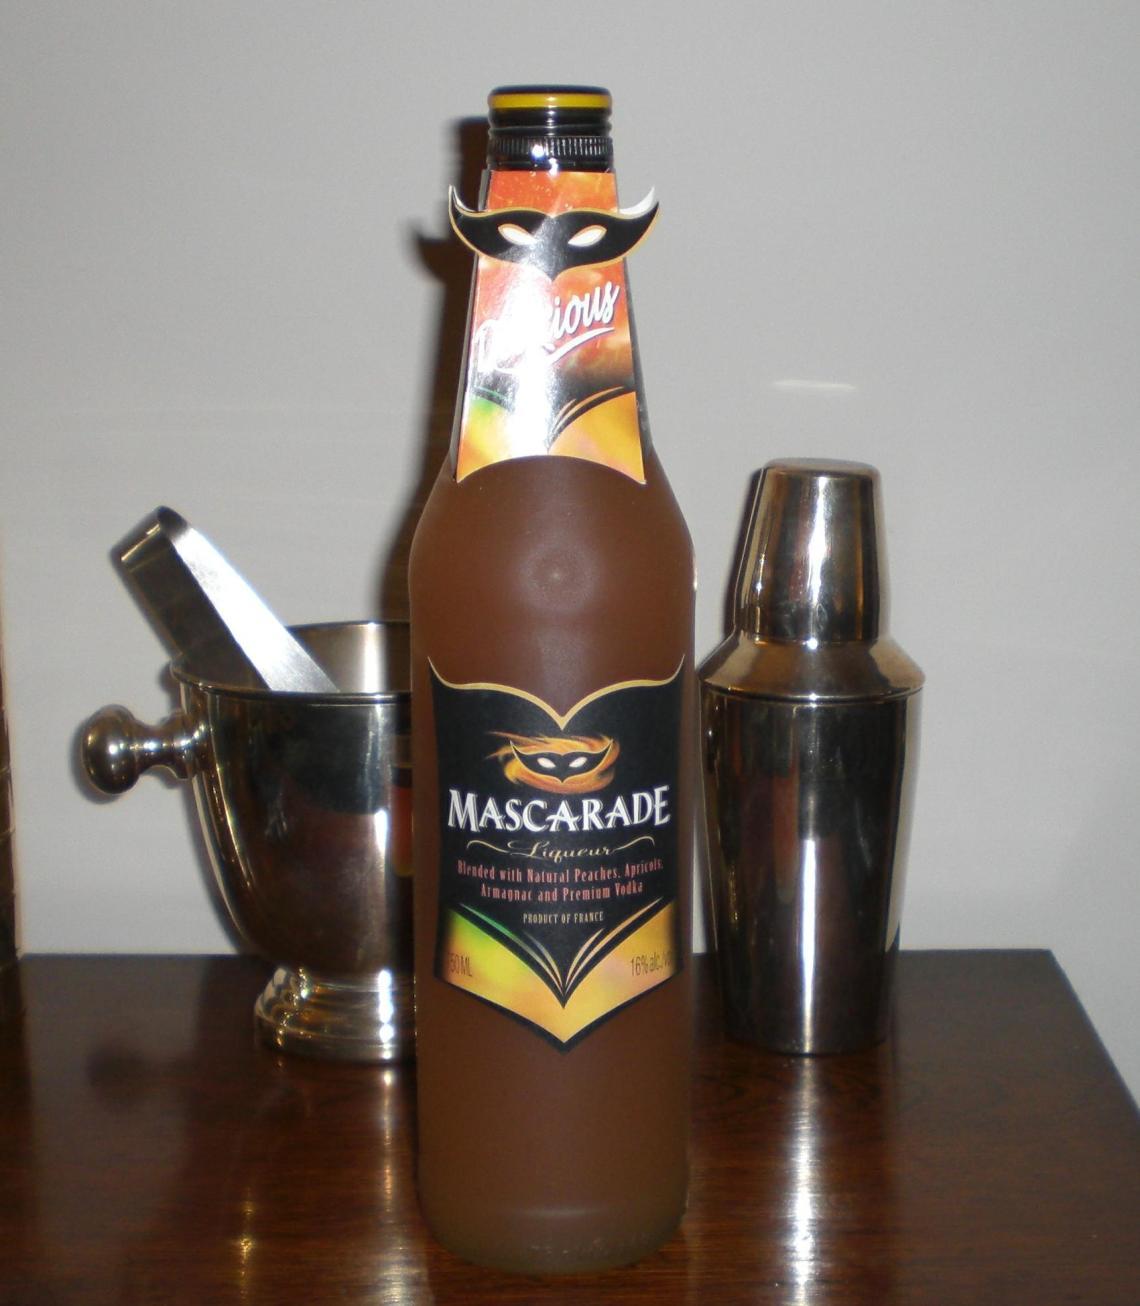 Mascarade Liqueur